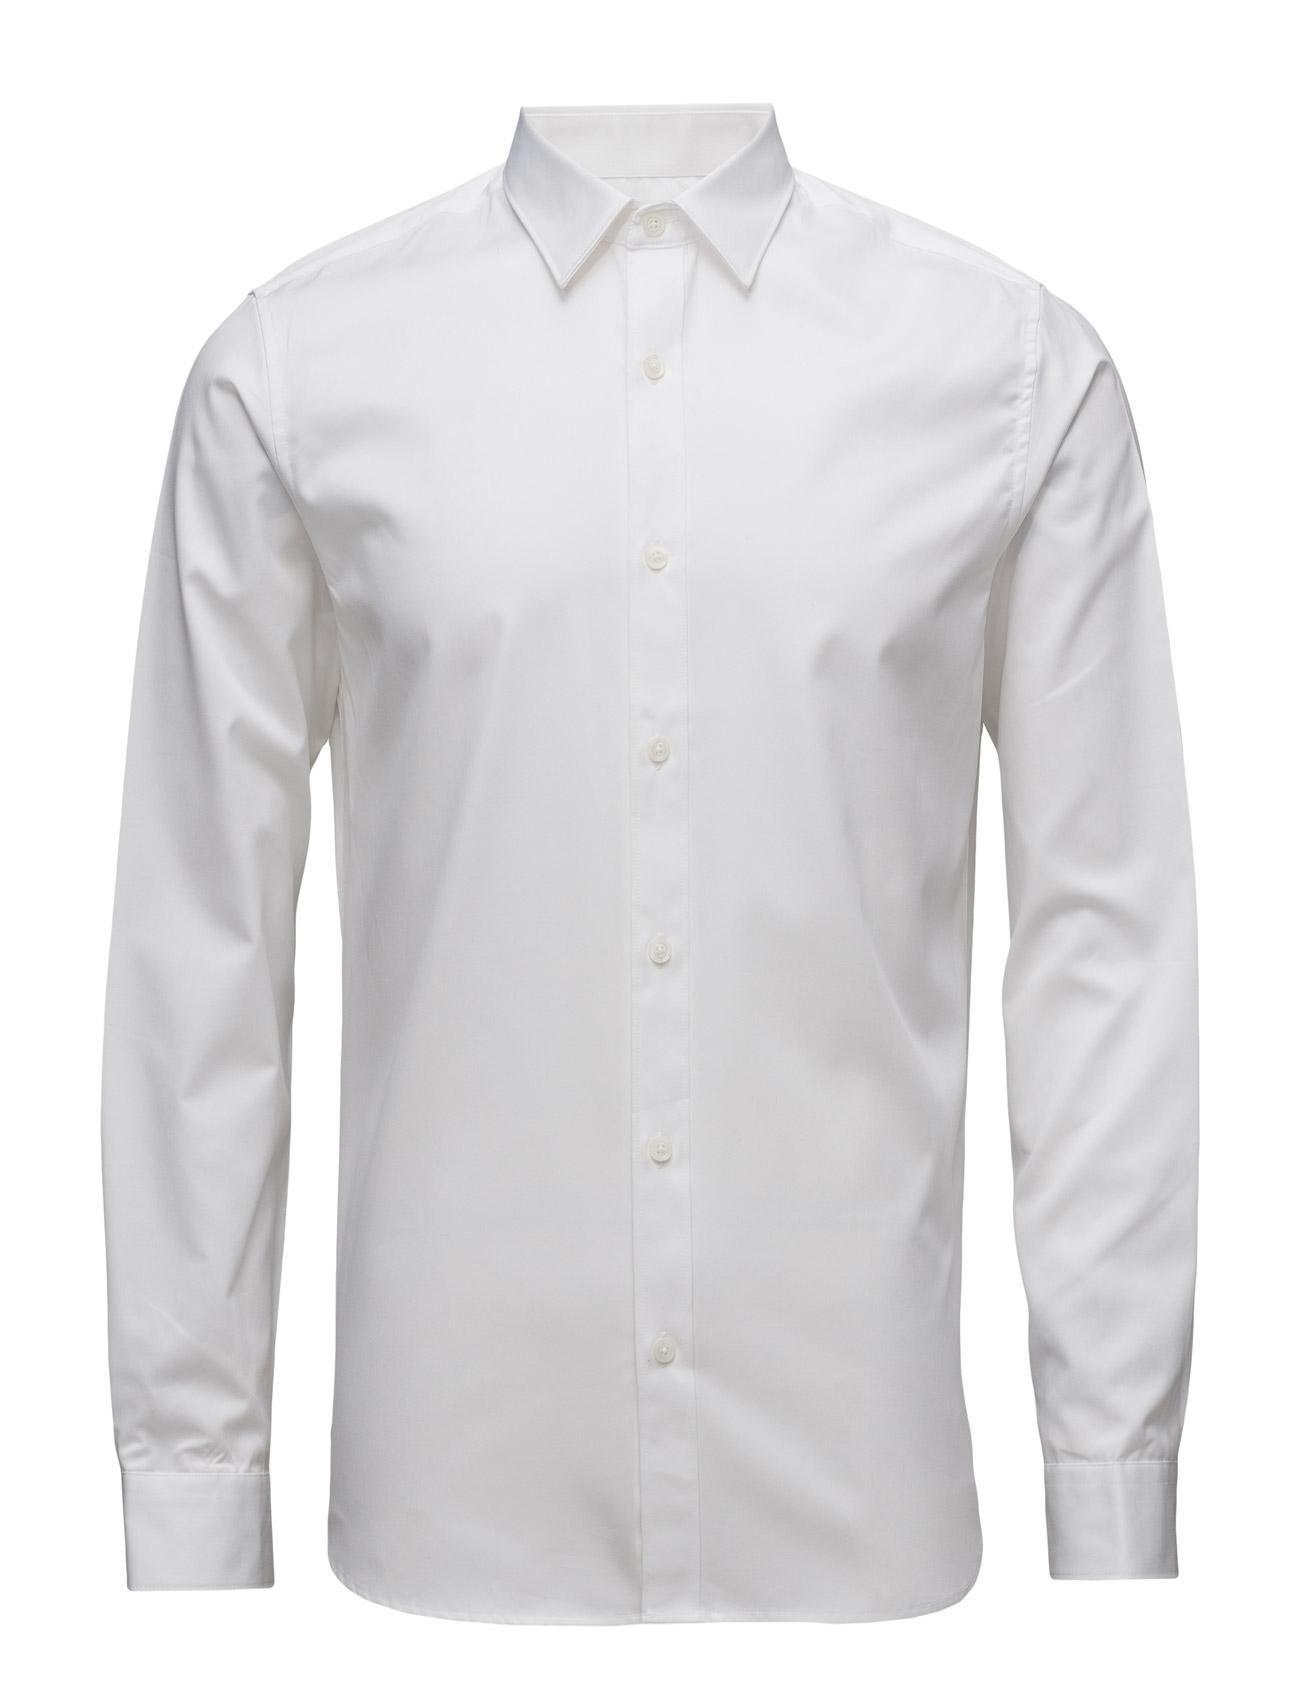 Shdone-Pelle Caracas Shirt Ls Noos Selected Homme Affärs